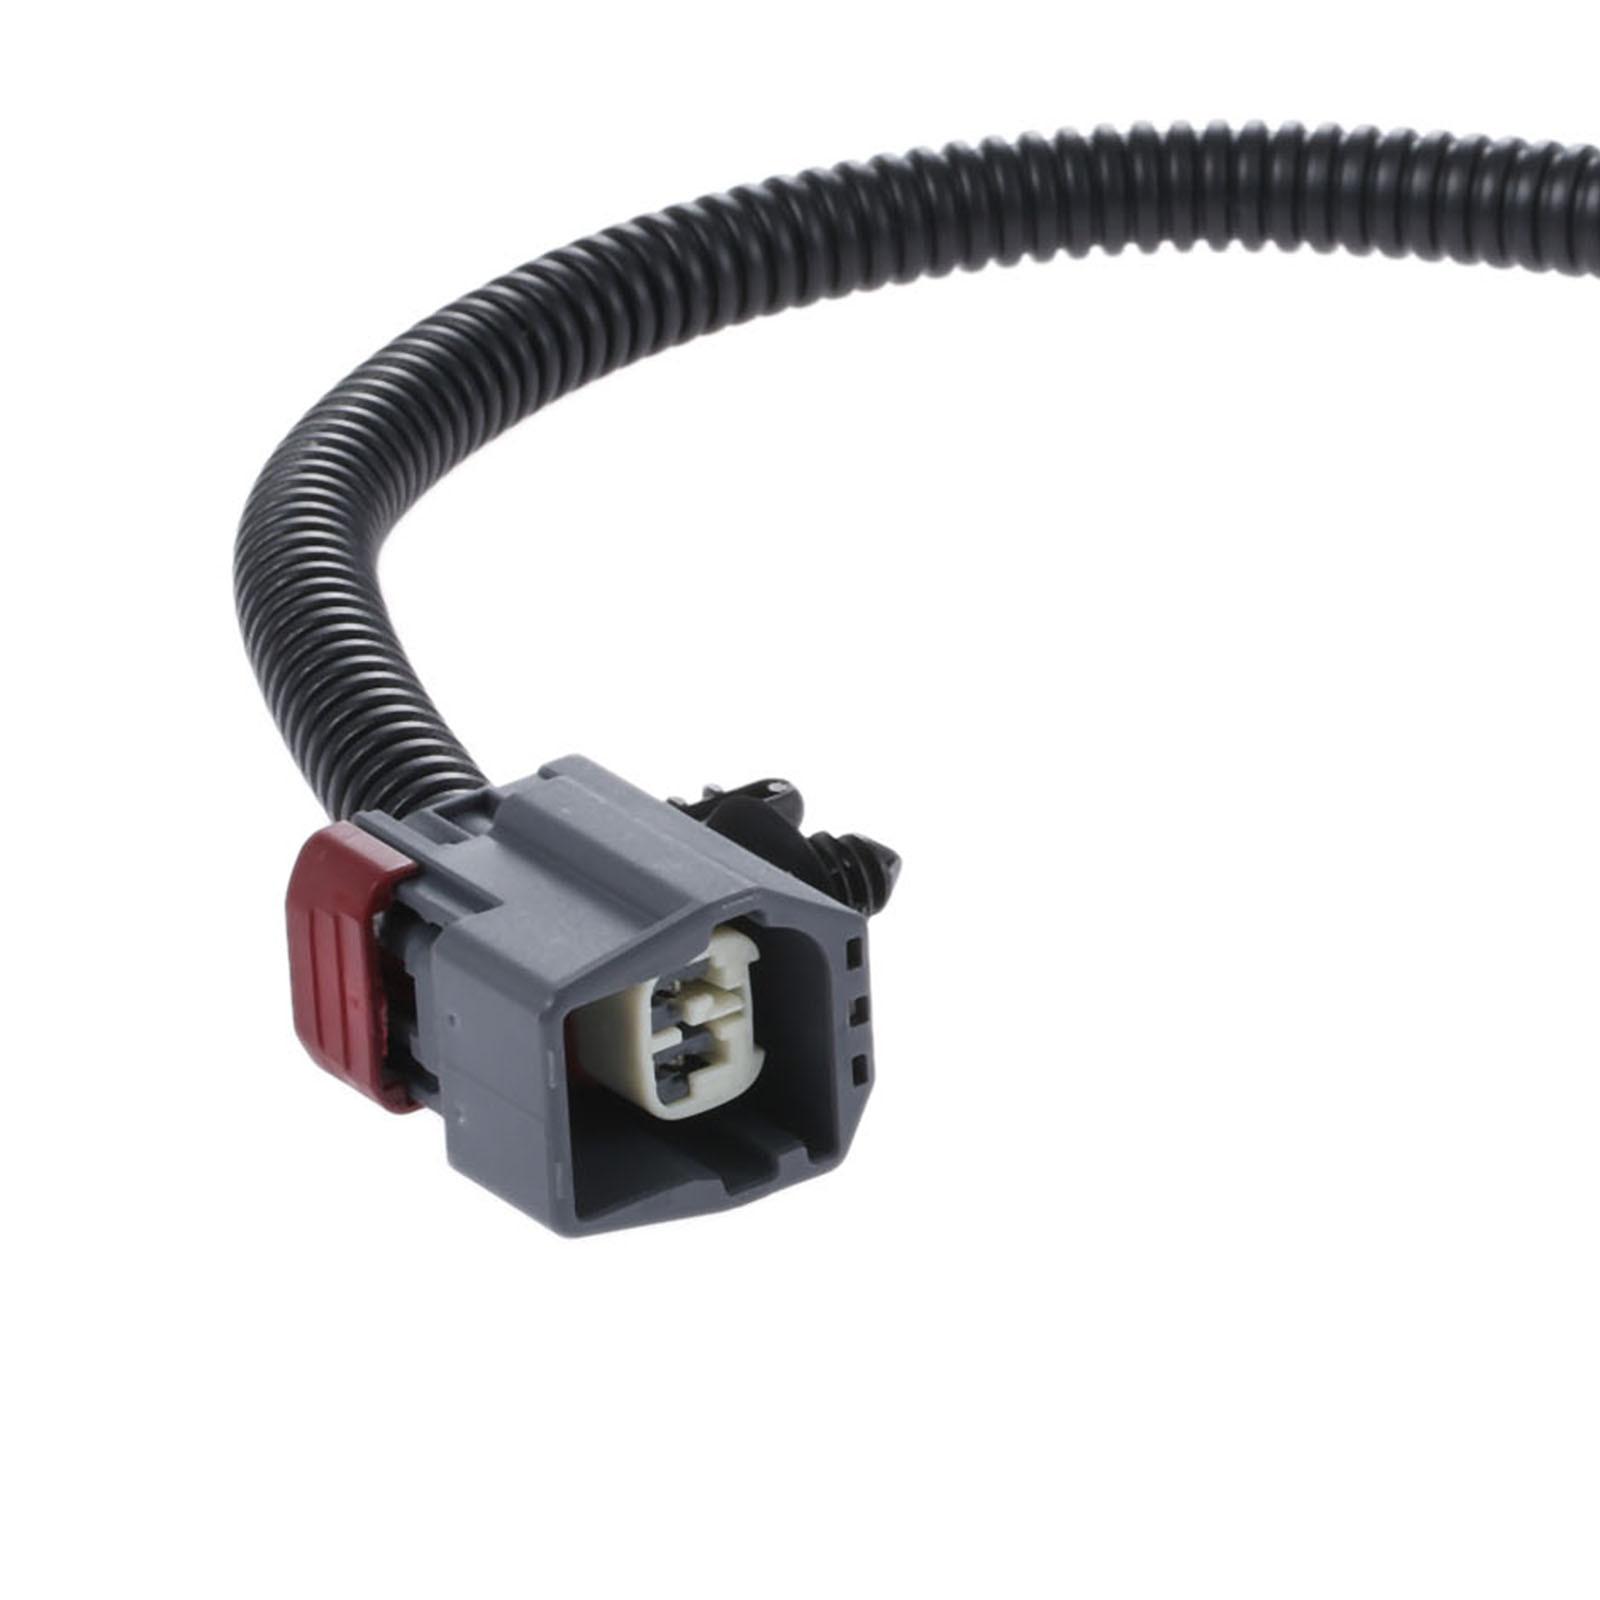 Image 5 - Yetaha 988F 6G004 CC Cylinder Head Temperature Sensor For Focus Mk1 MK2 1.8 2.0 Transit Mk7 MK6 TOURNEO JAGUAR X TYPE 2.0D 2.2 D-in Temperature Sensor from Automobiles & Motorcycles